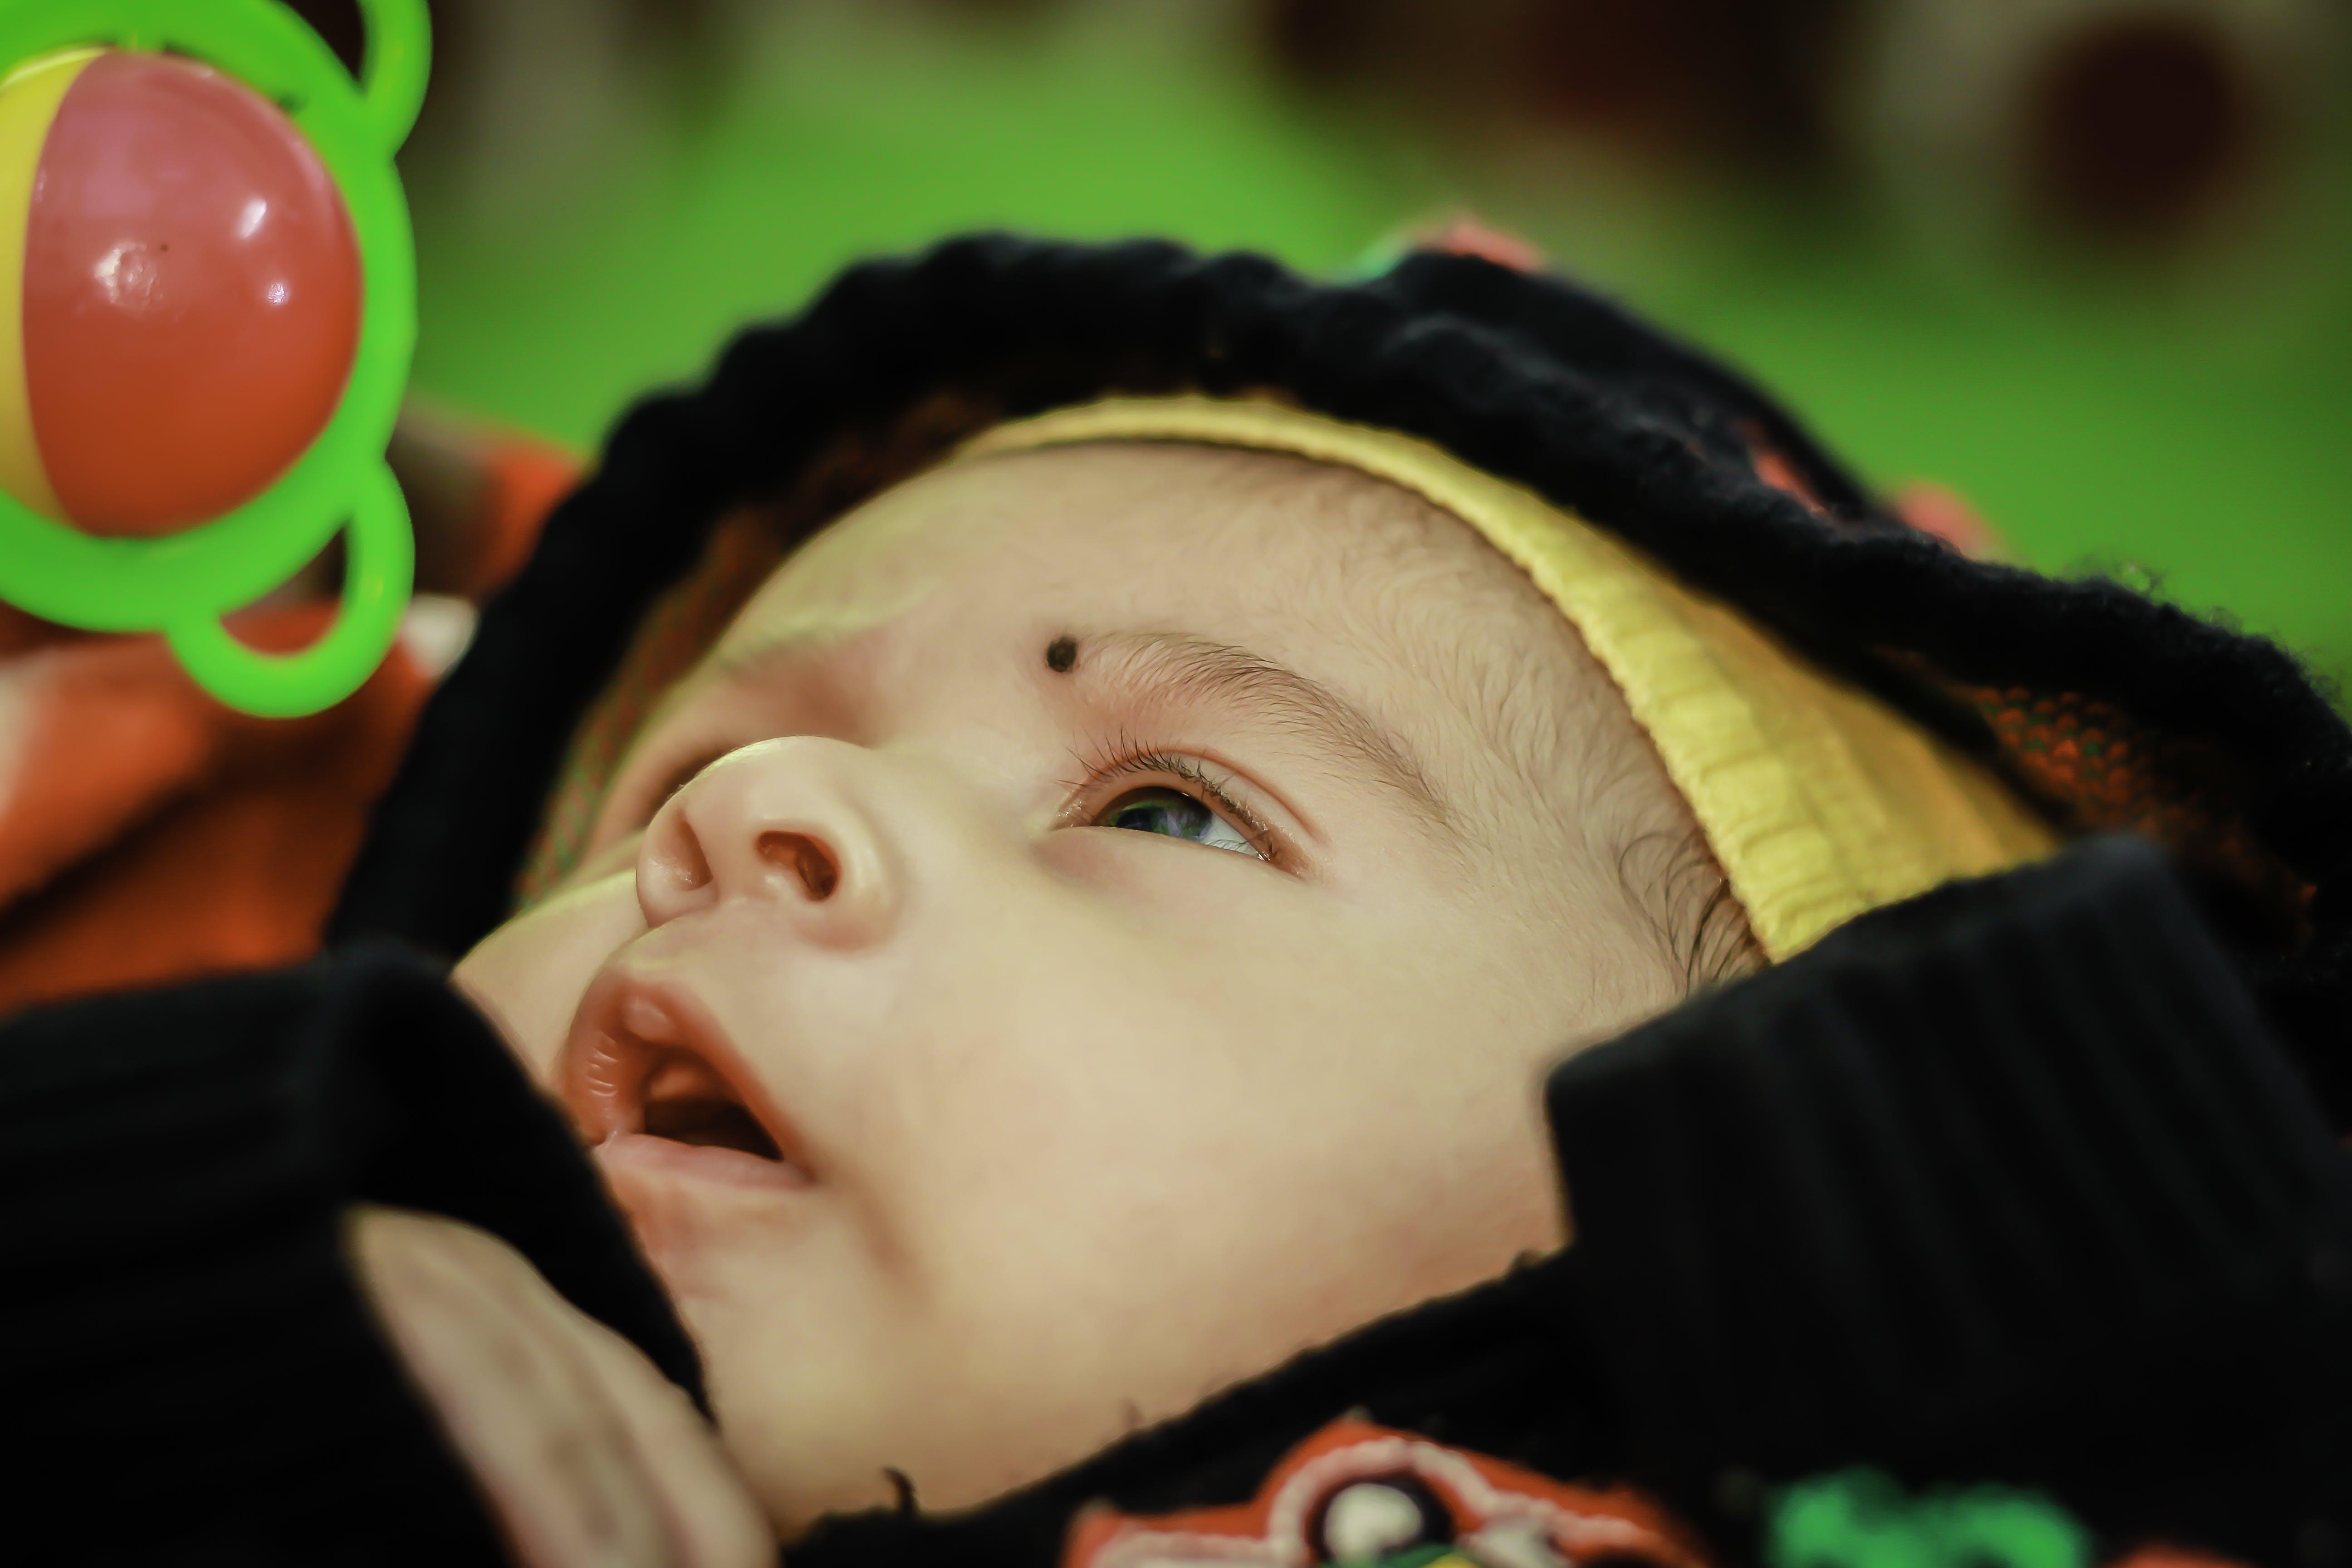 Free stock photo of baby girl, childhood, cute girl, new born